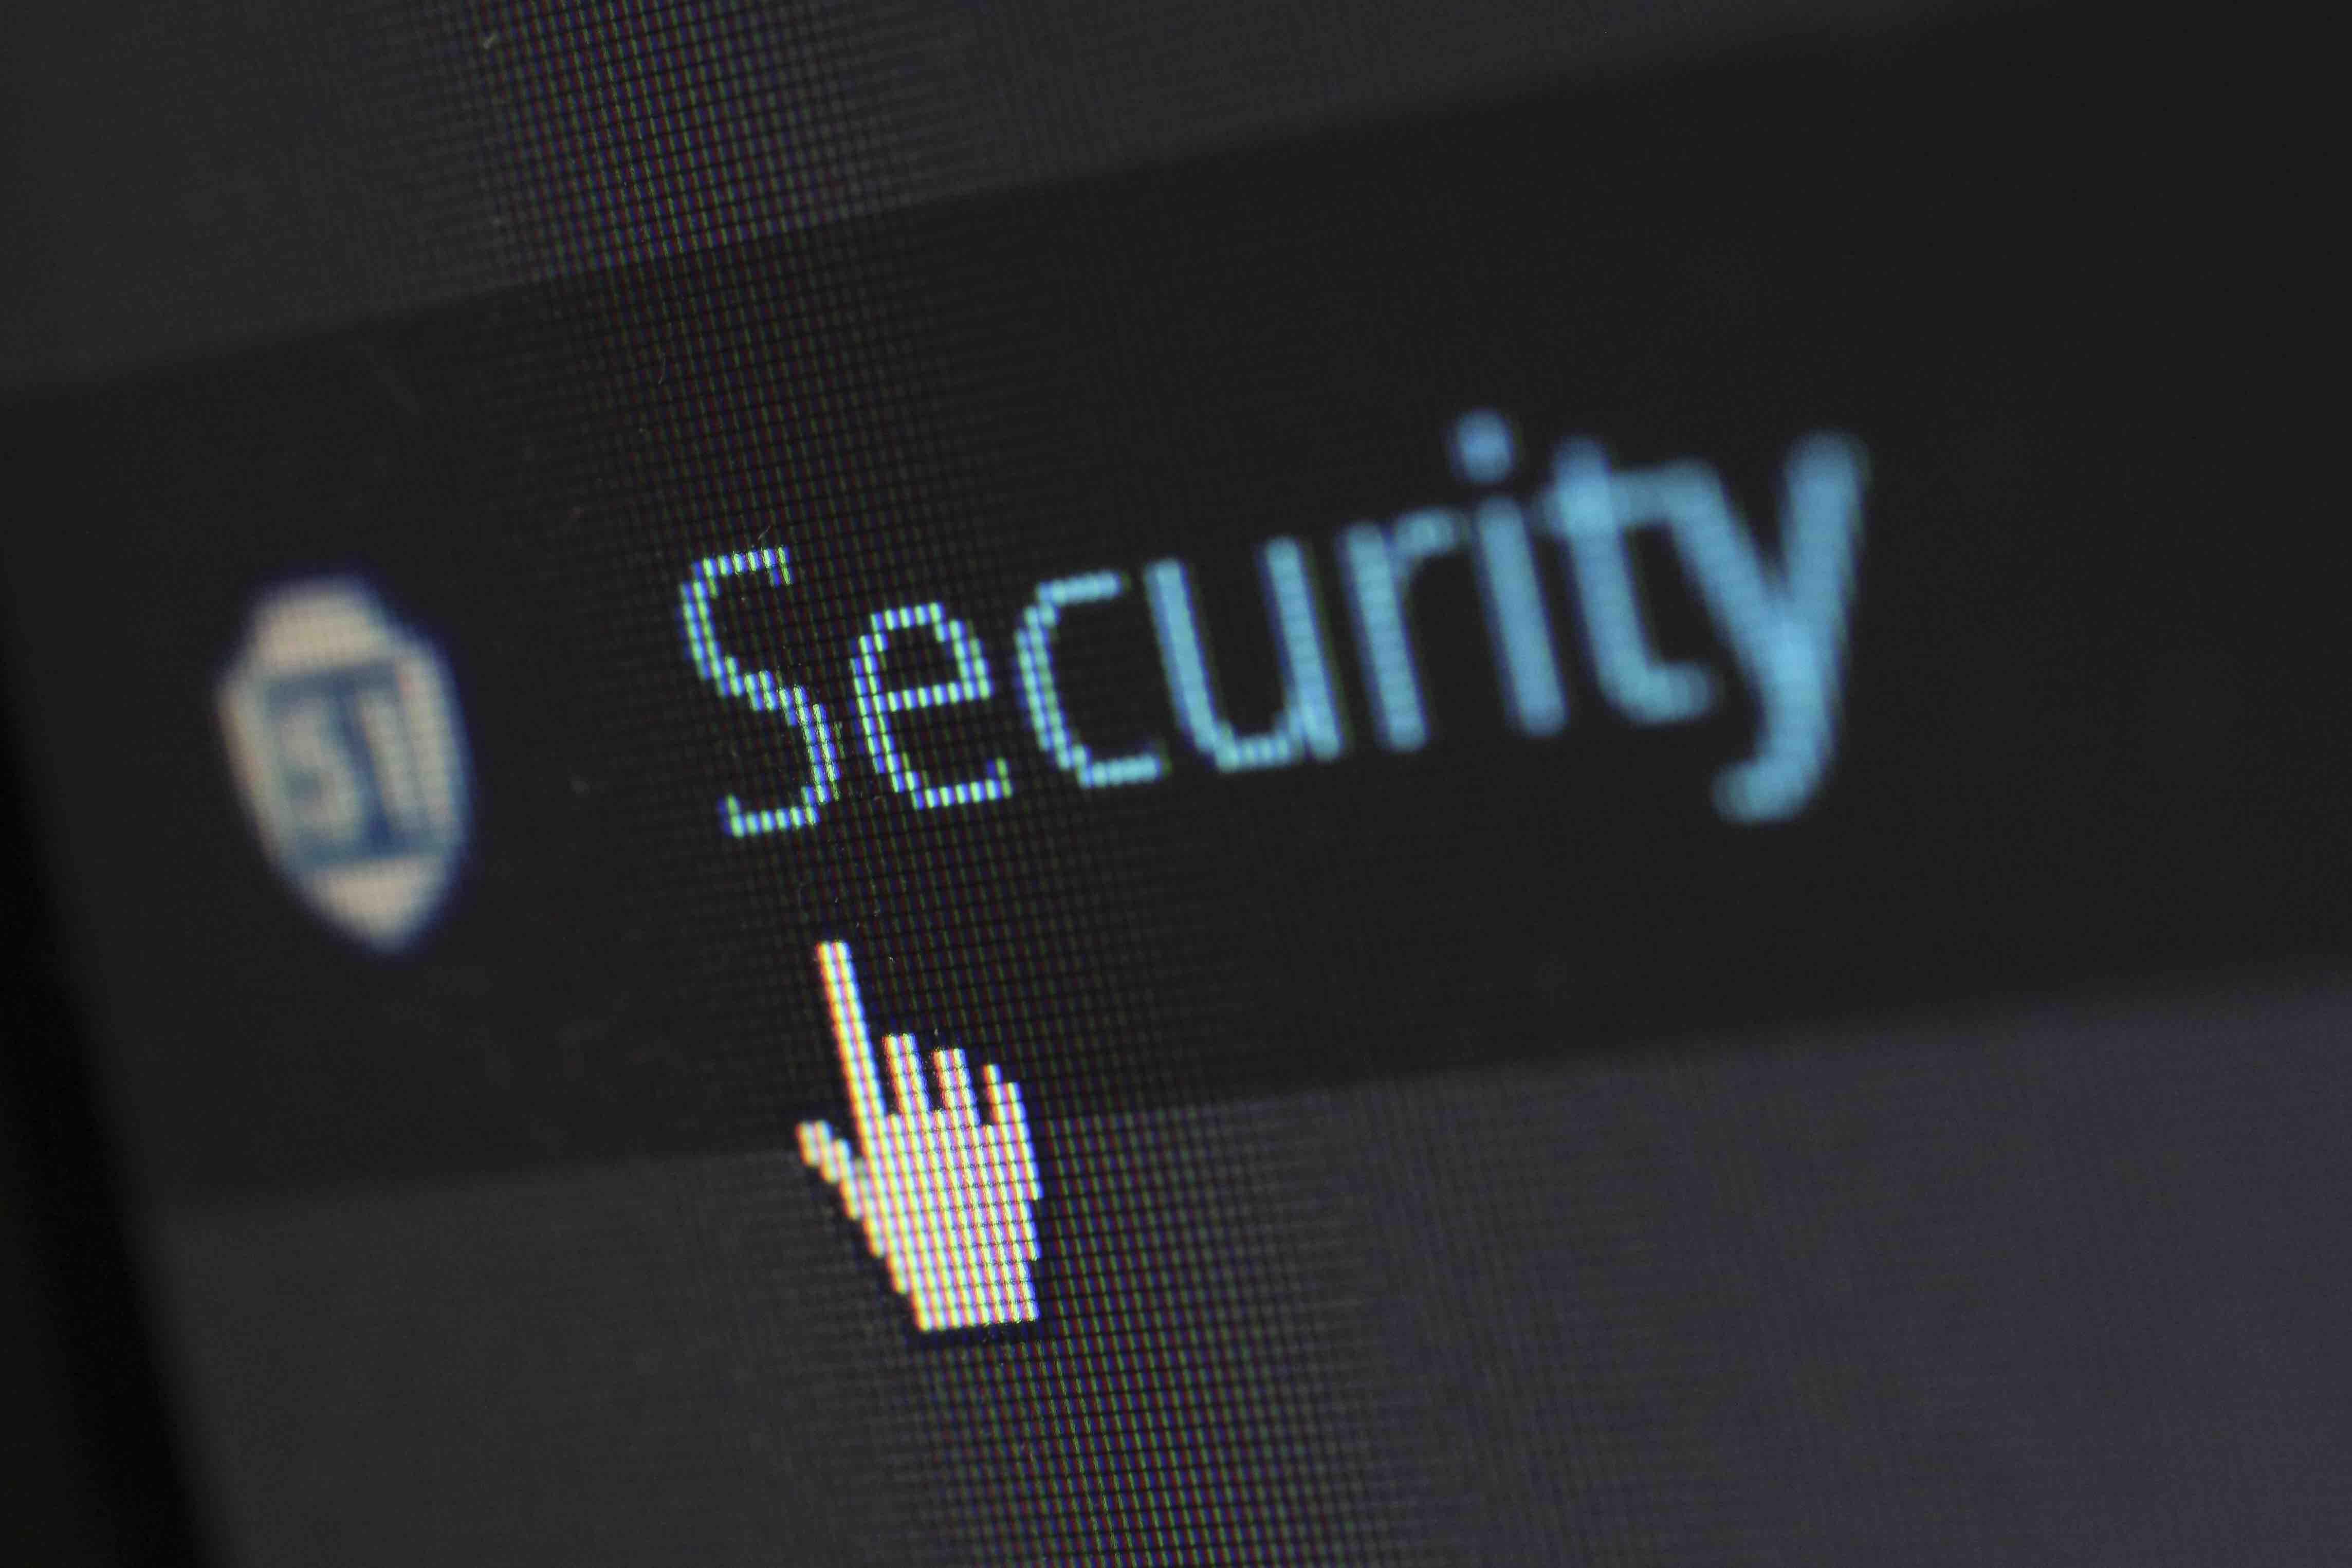 SpringBoot项目中使用SpringSecurity和JWT做权限认证